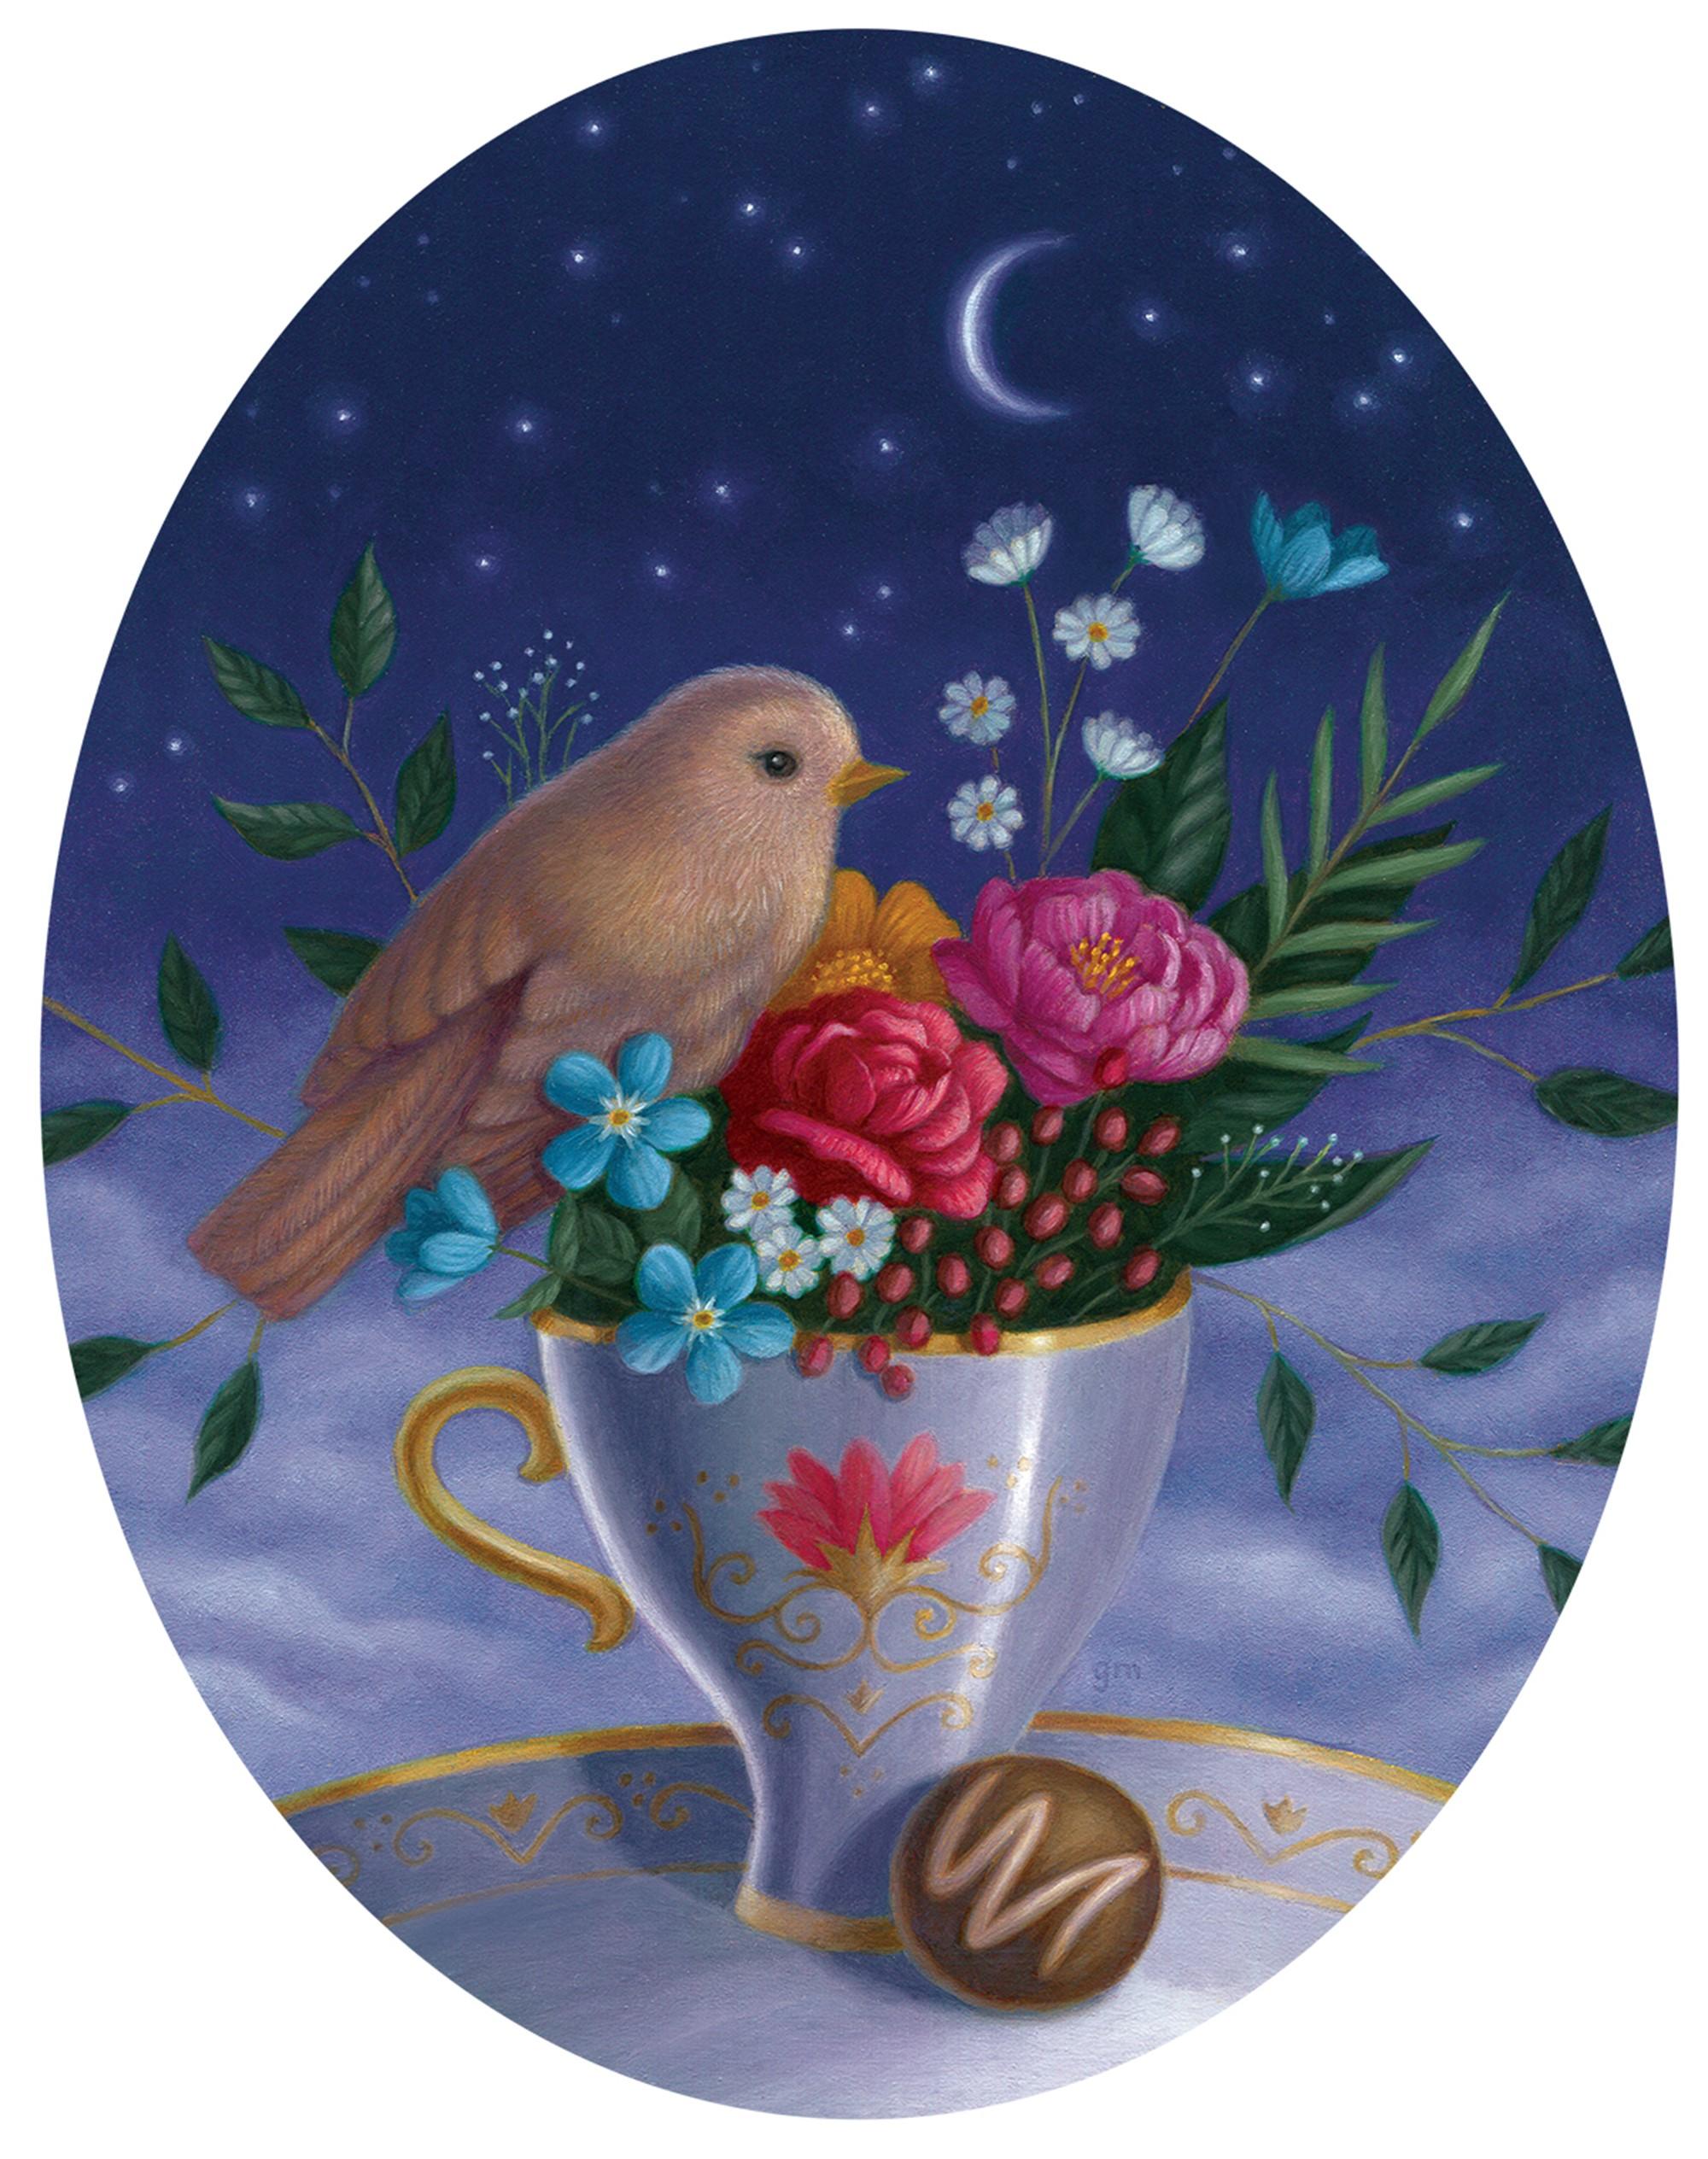 Tea by Starlight by Gina Matarazzo